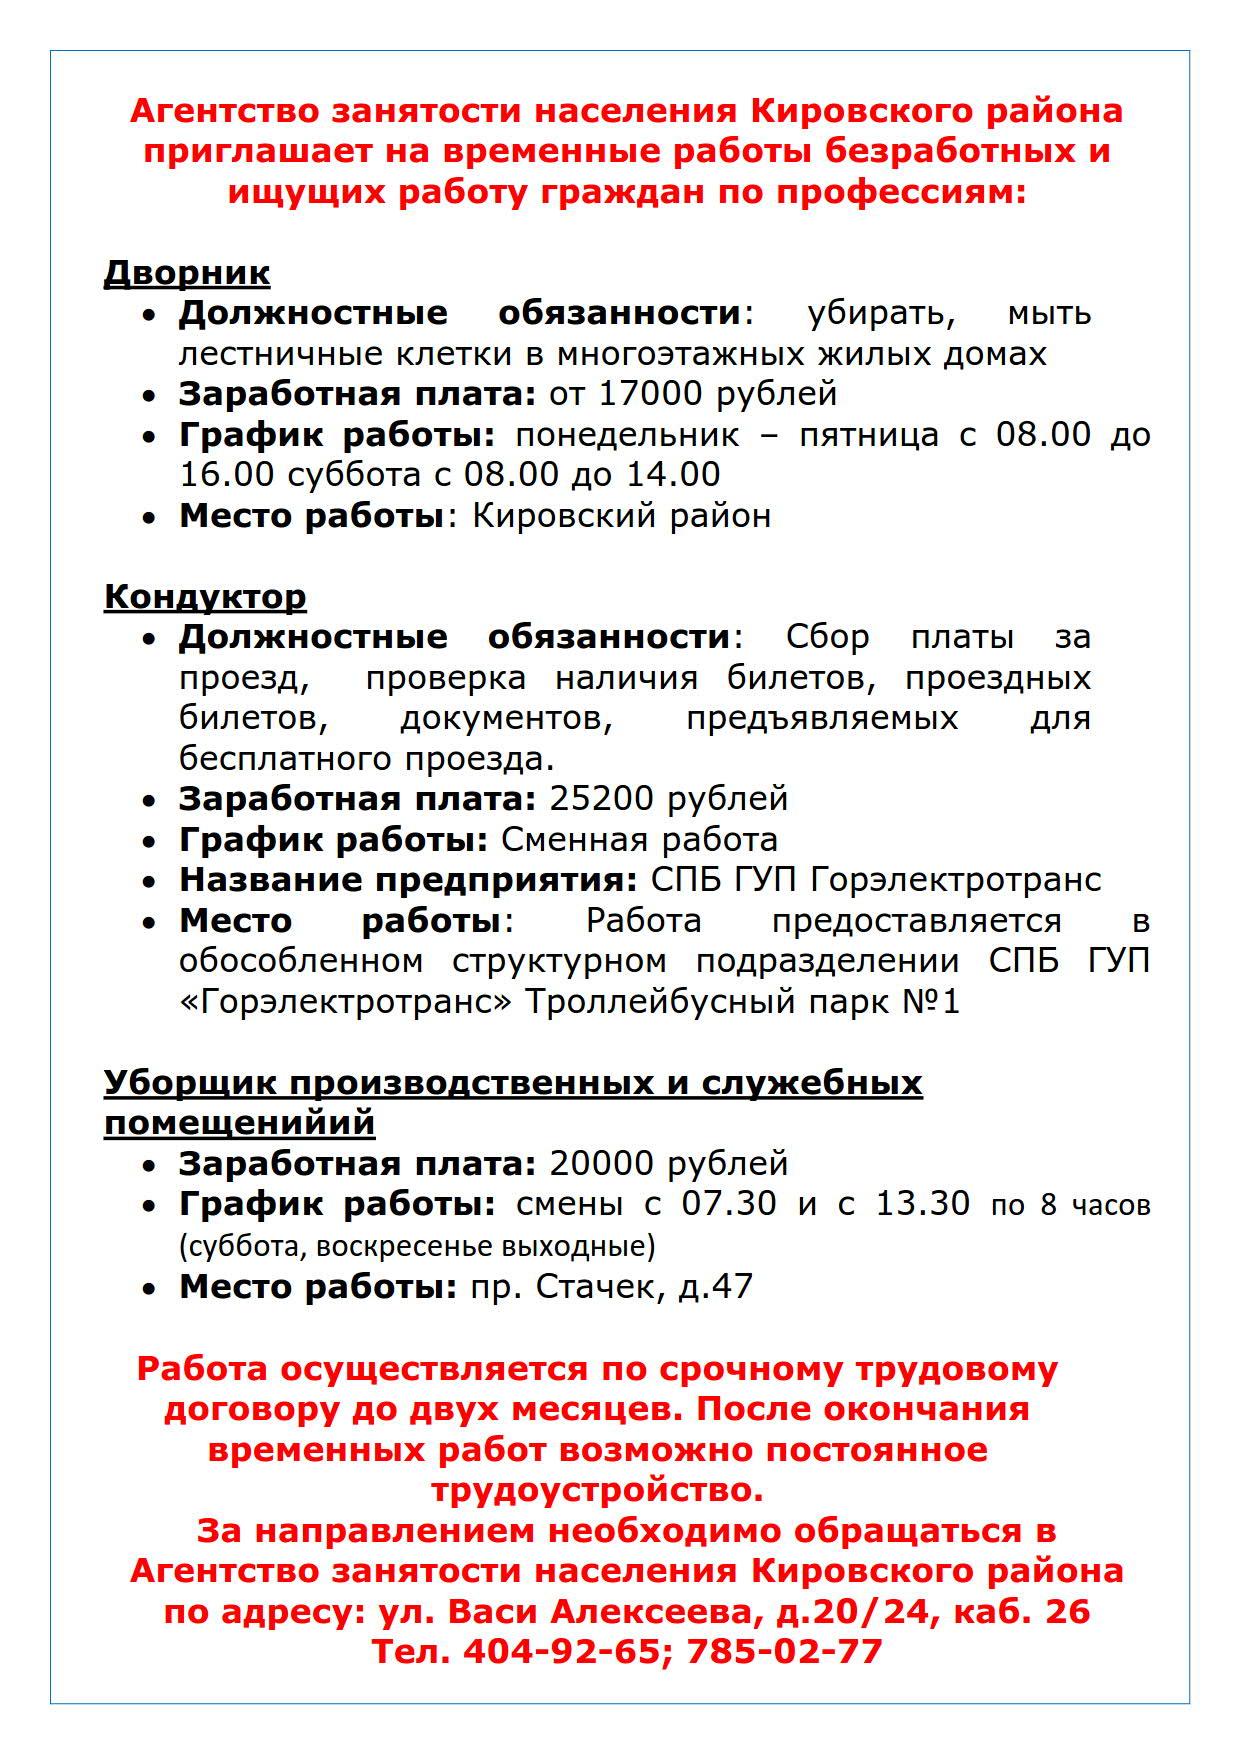 в газету_1